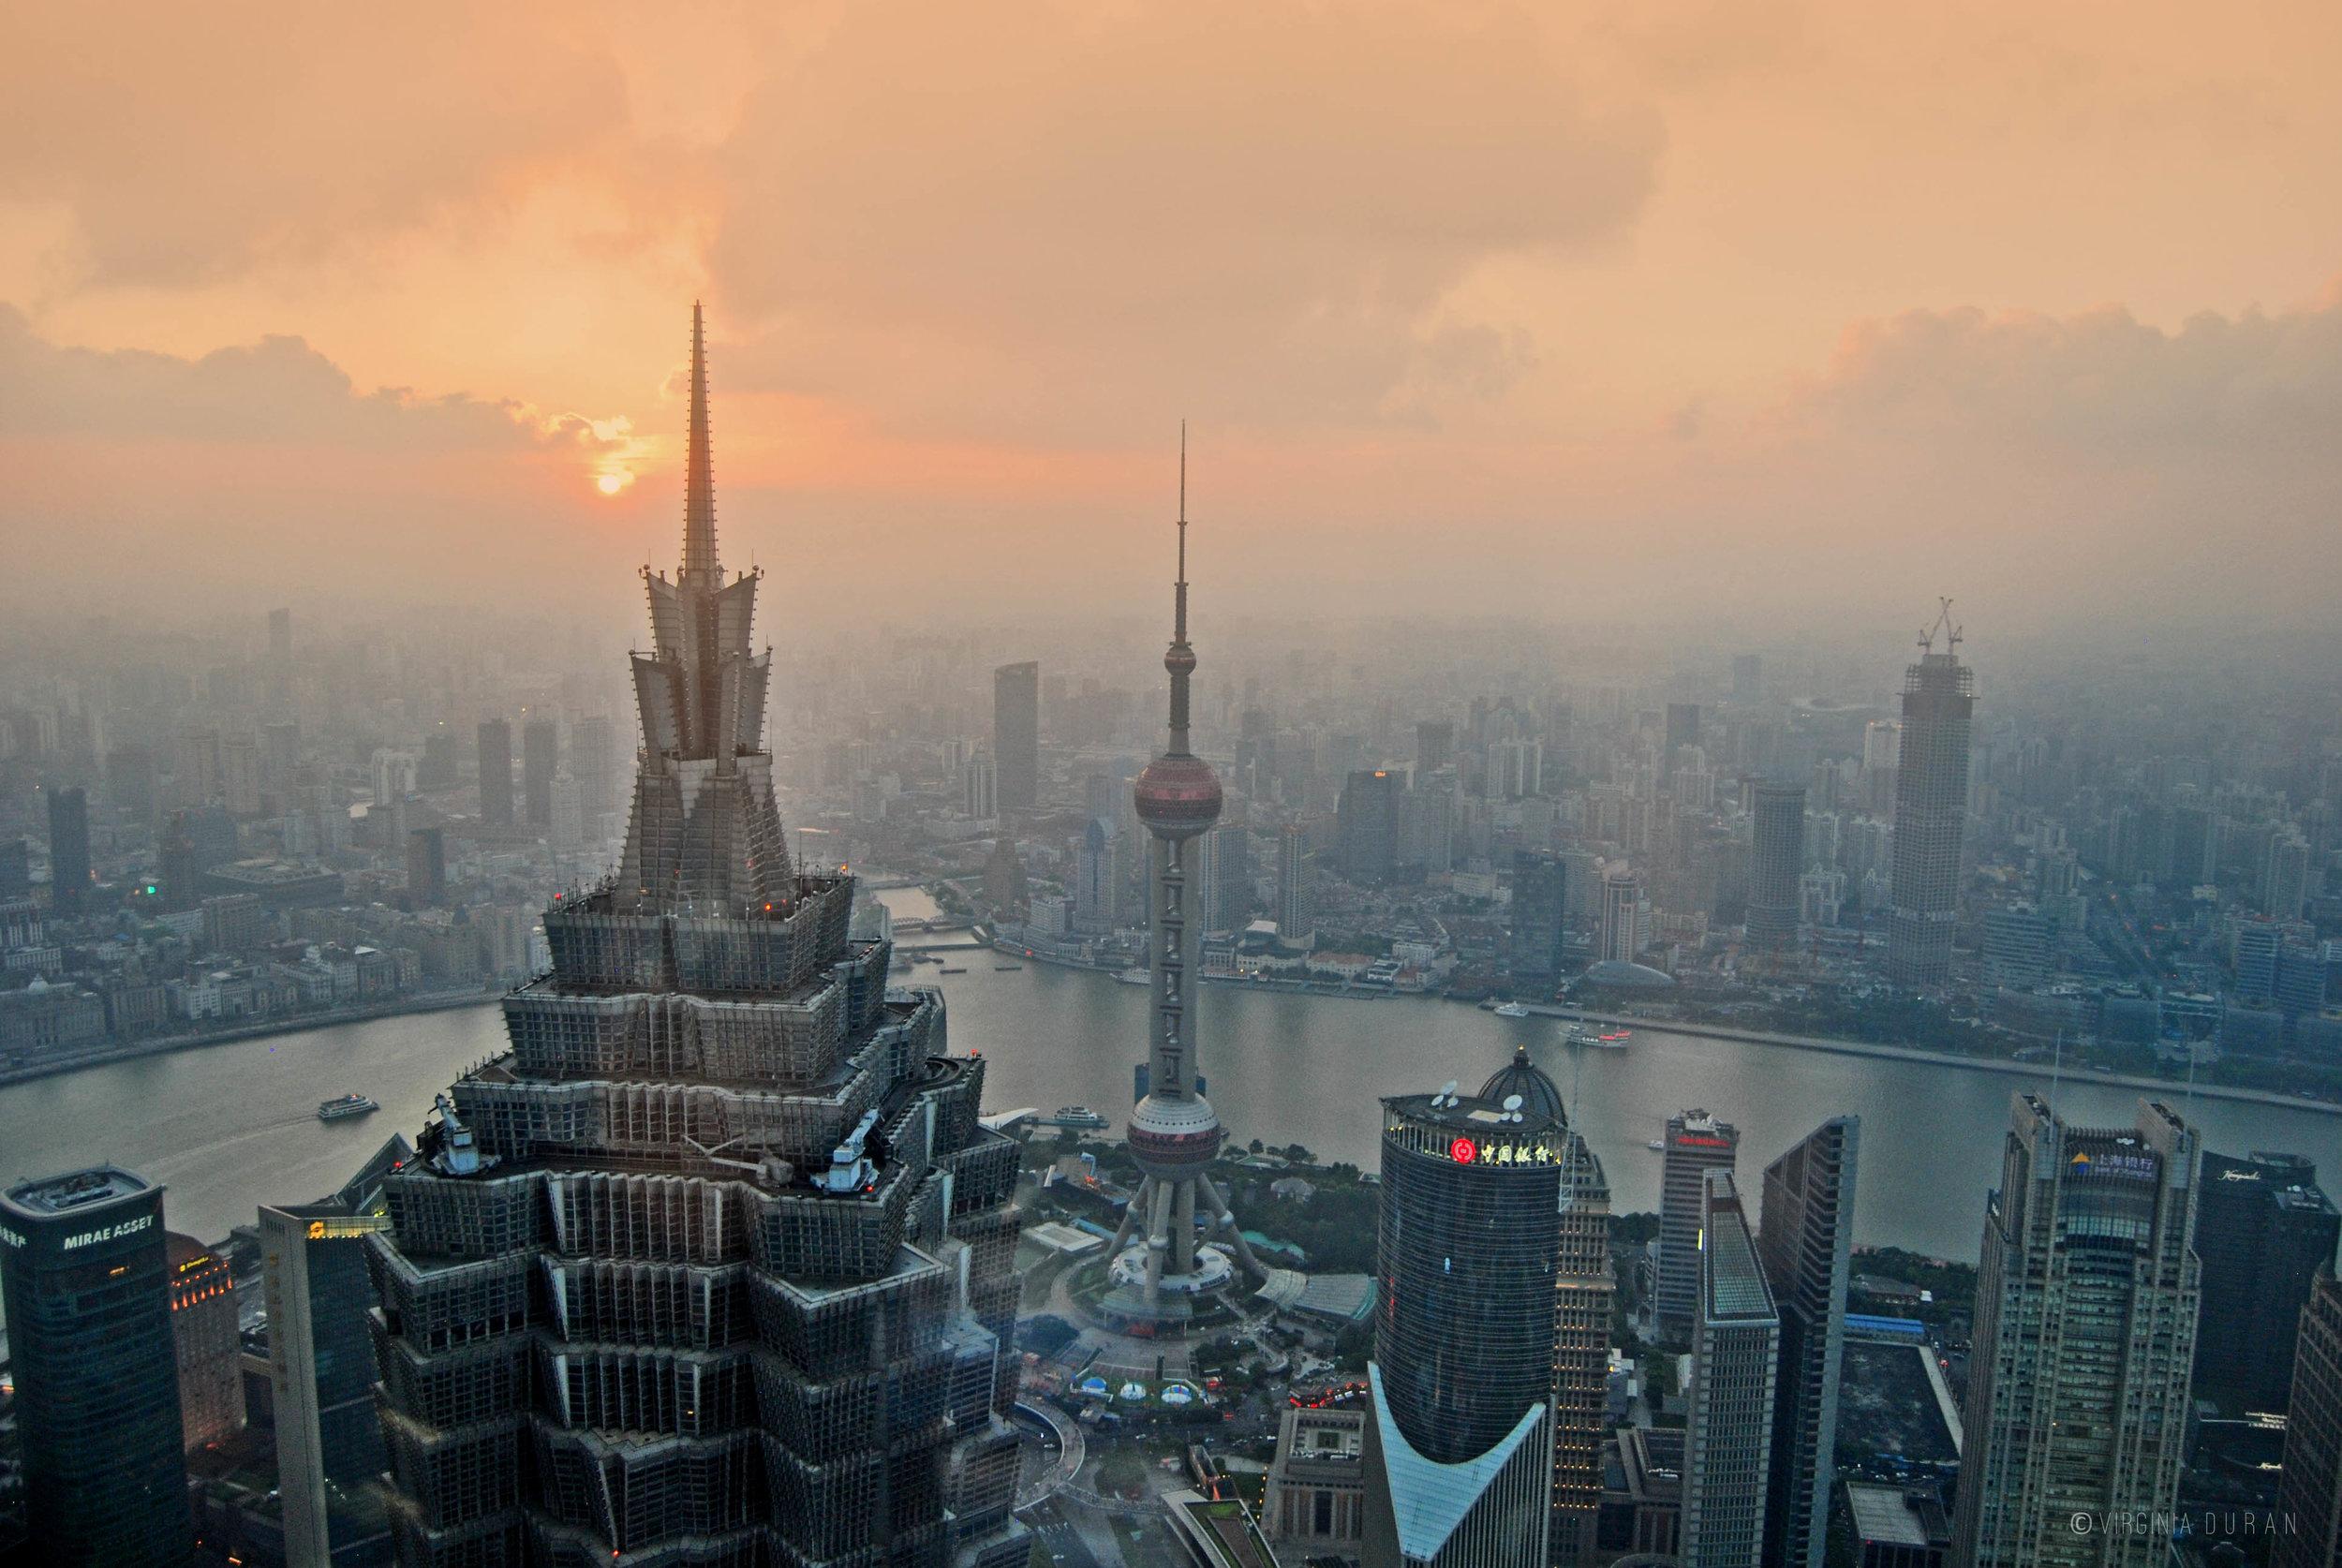 virginia-duran-blog-sites-to-take-the-best-skyline-pictures-in-shanghai-park-hyatt-world-financial-center.jpg